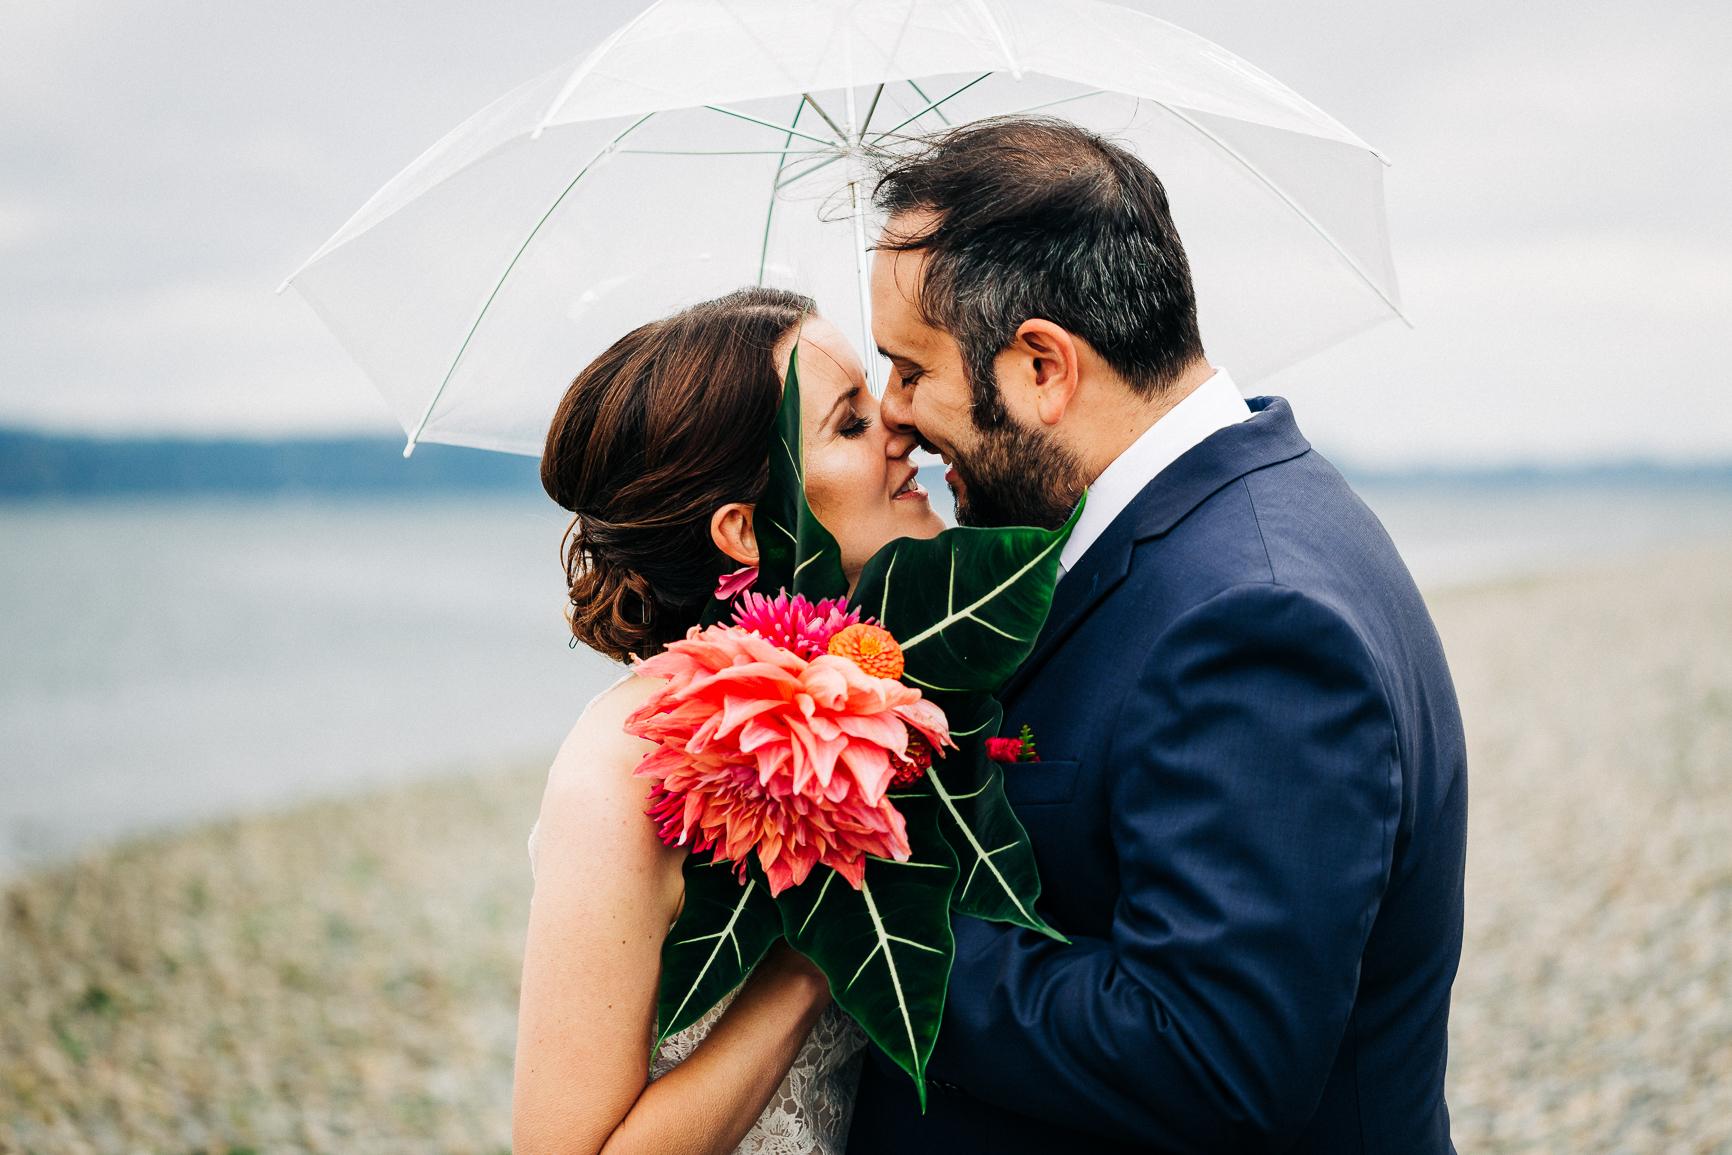 A kiss in the rain - Seattle, WA